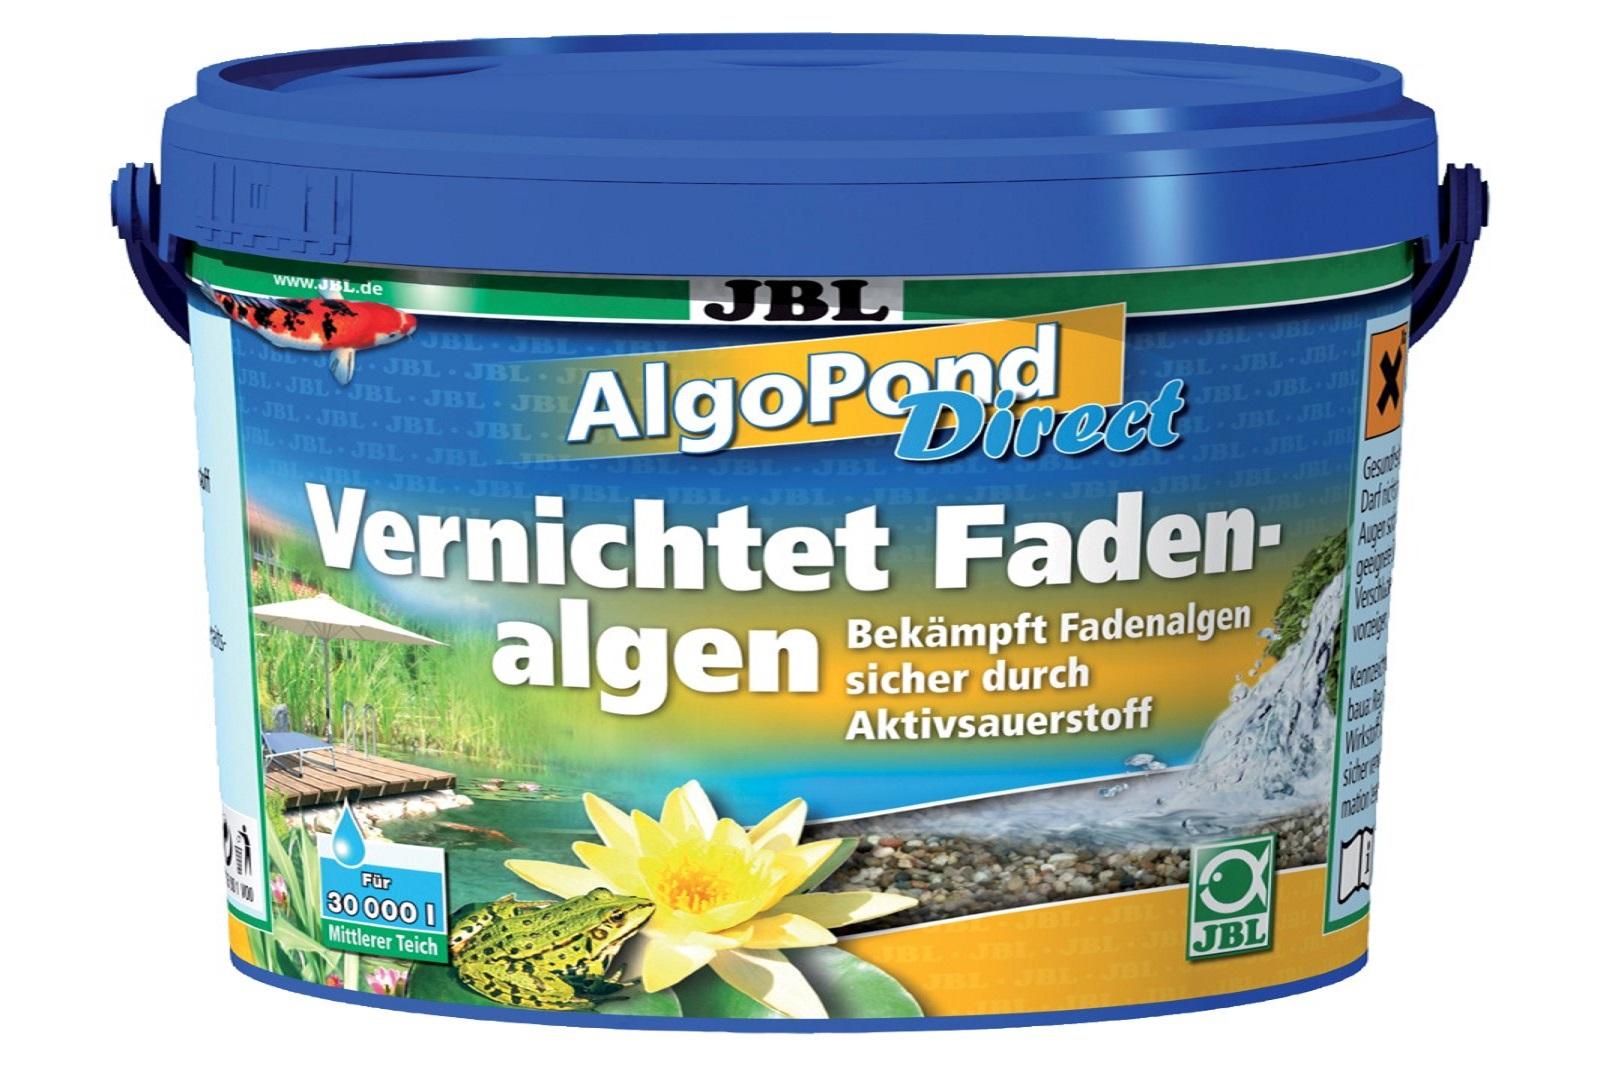 JBL AlgoPond Direct 1 kg   vernichtet Fadenalgen